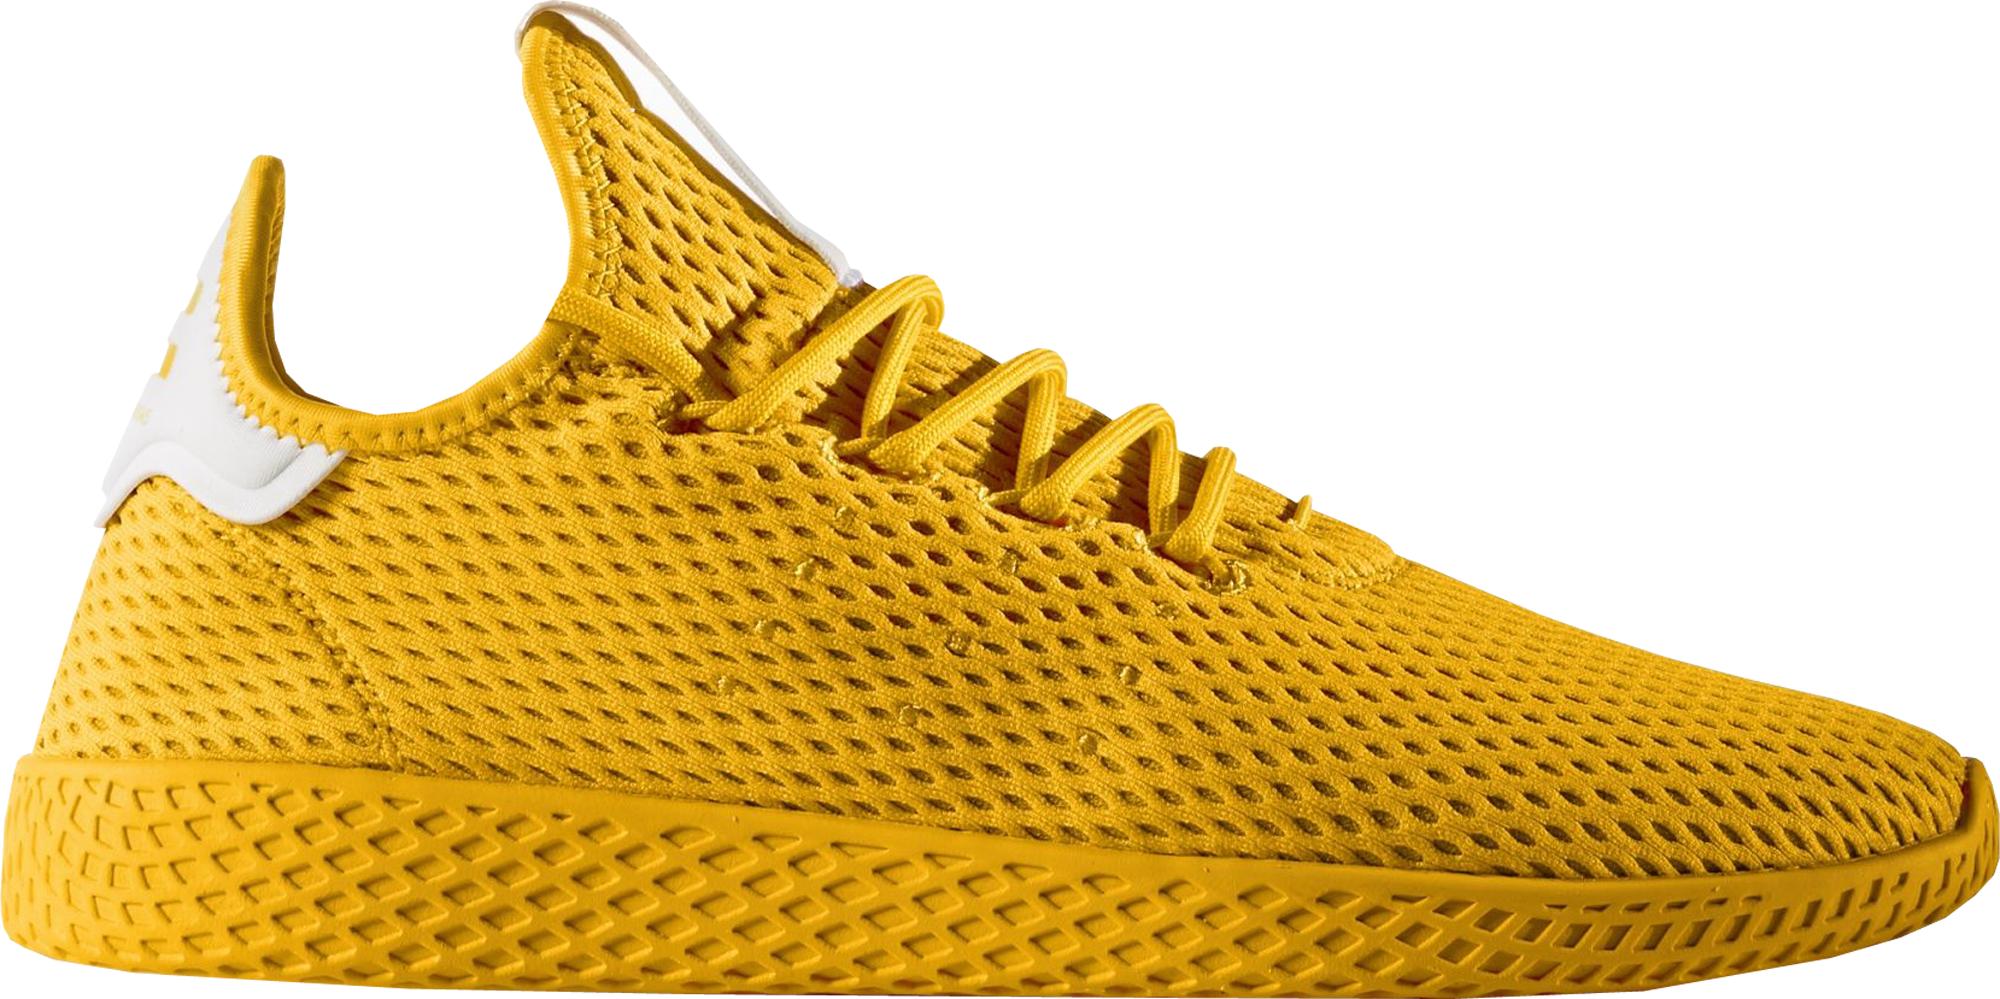 adidas Tennis Hu Pharrell Solid Gold